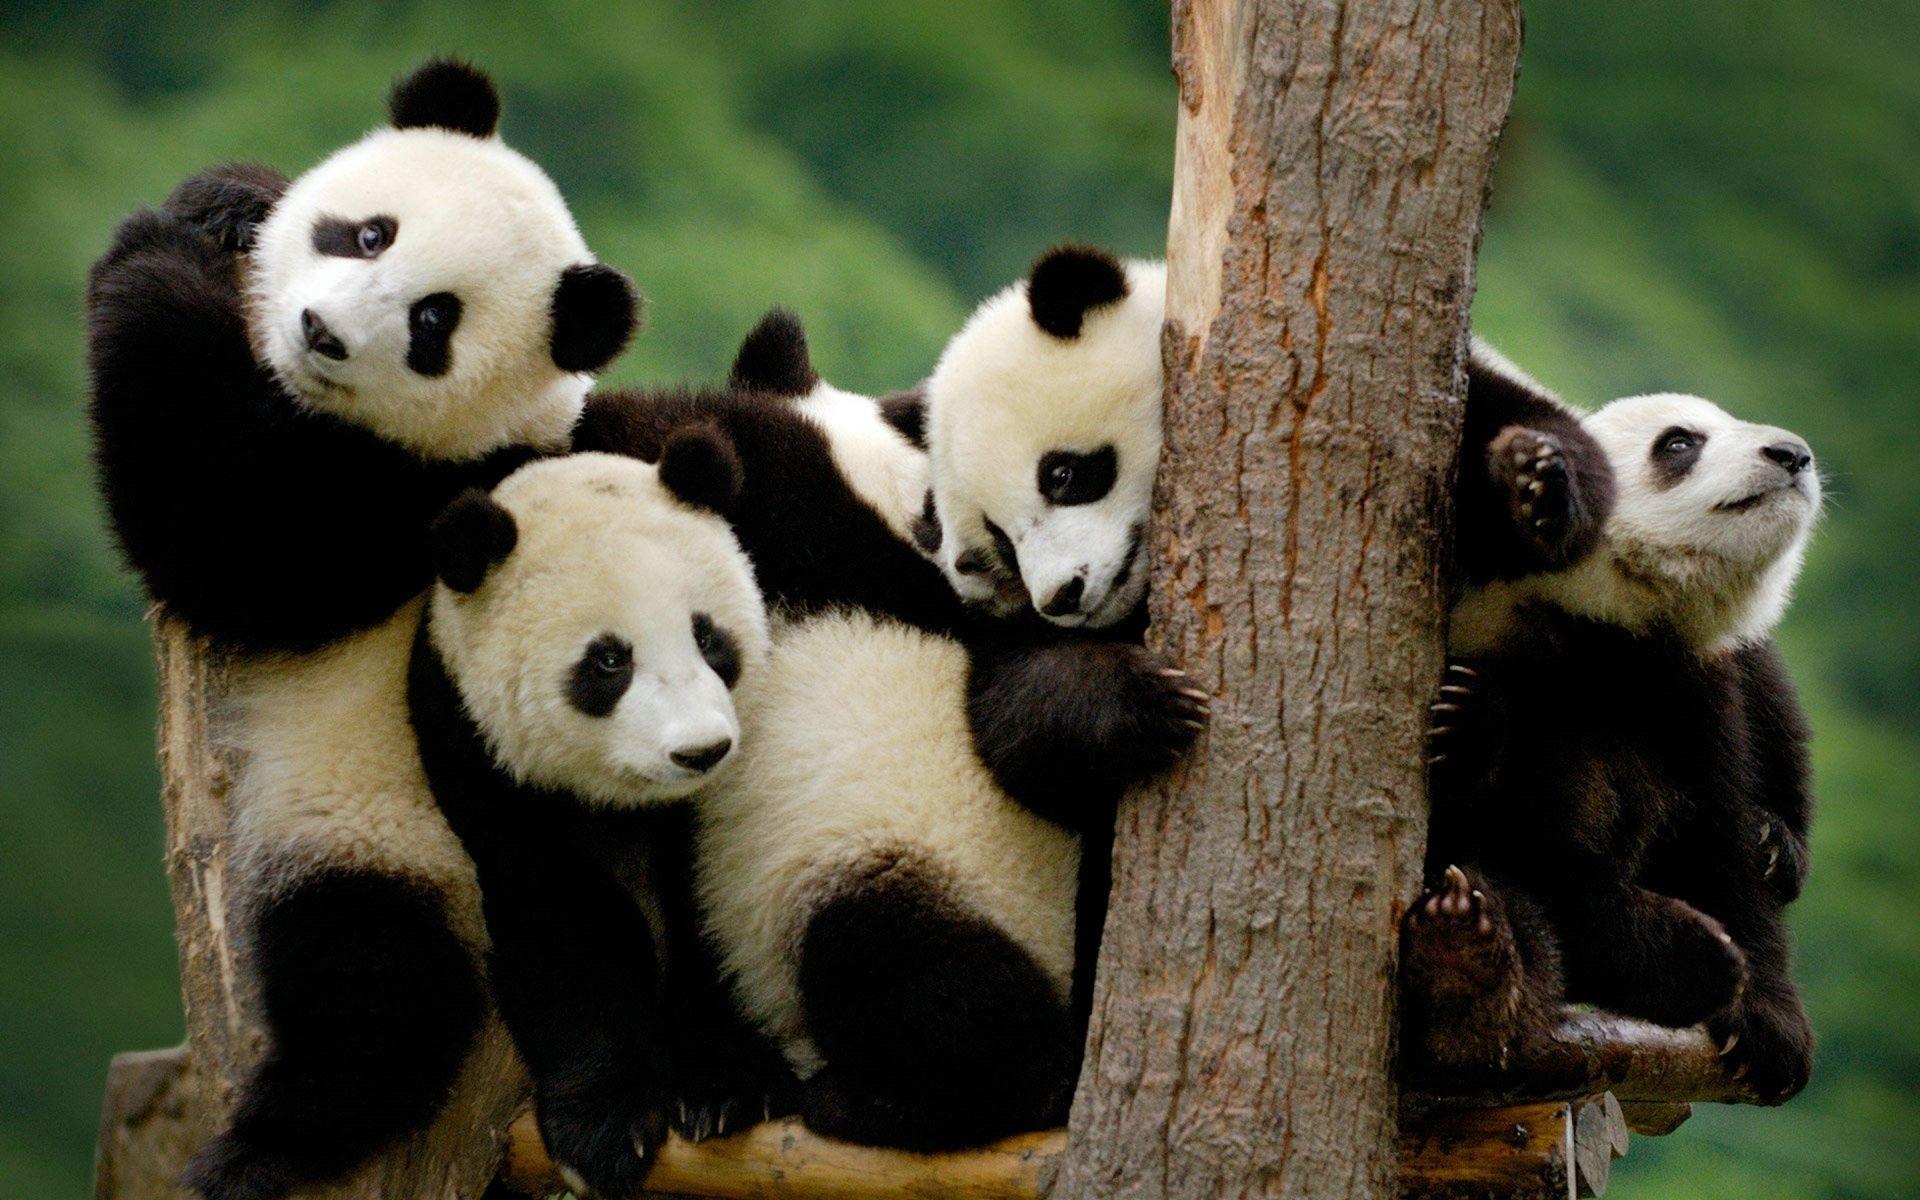 hinh gau truc panda 7